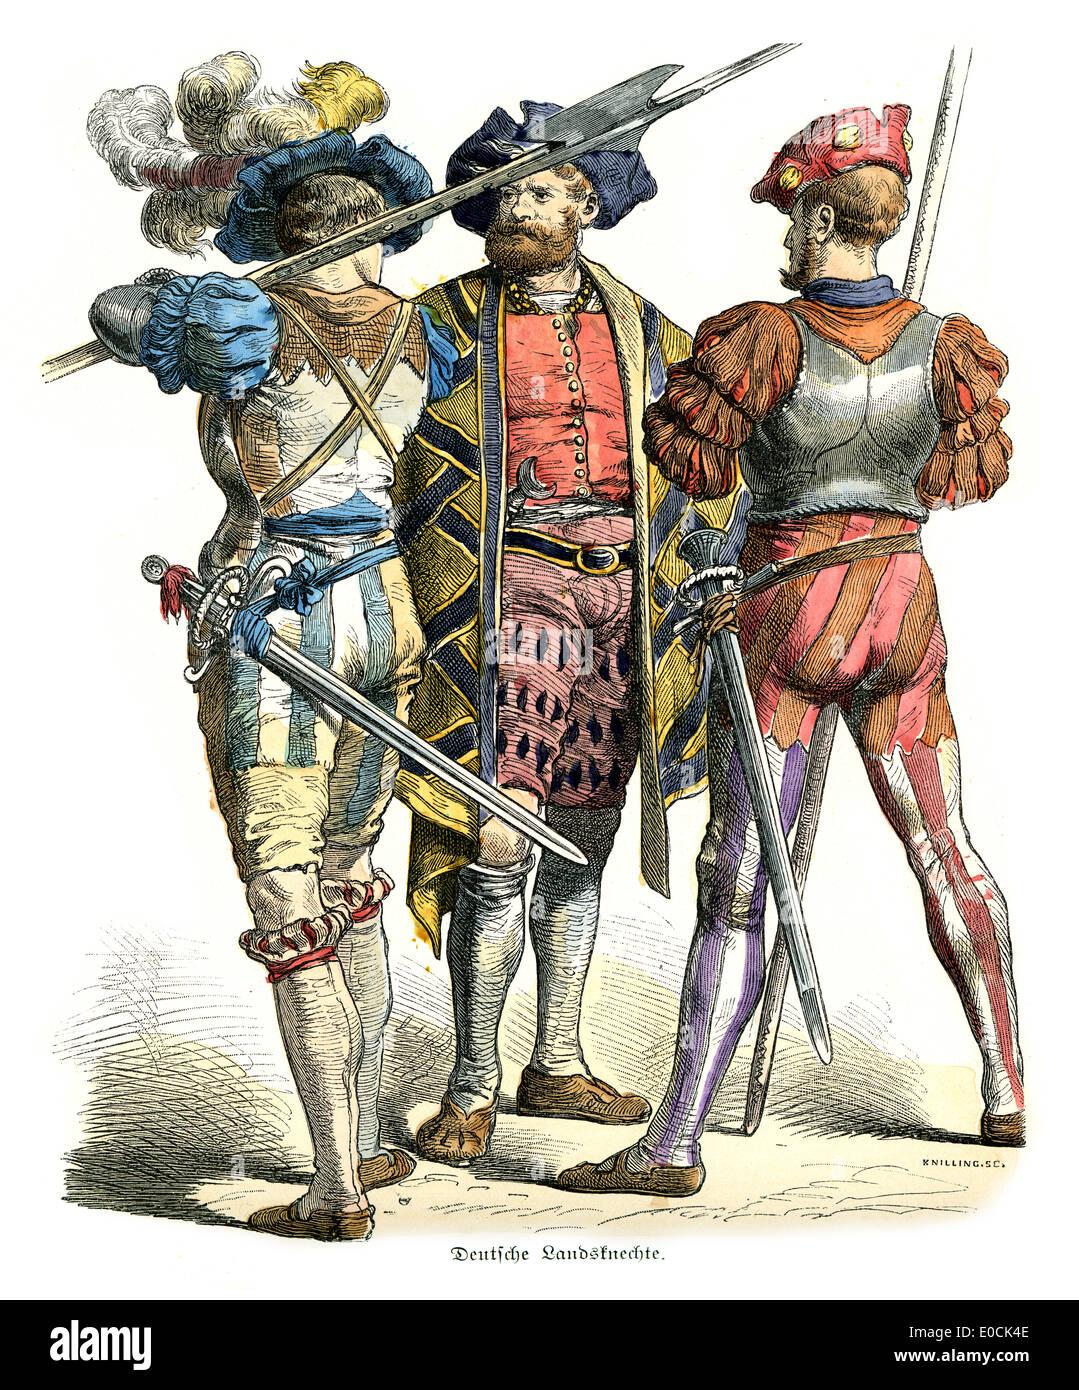 German Landsknechte of the 16th Century. The German Landsknechte, were colourful mercenary soldiers - Stock Image